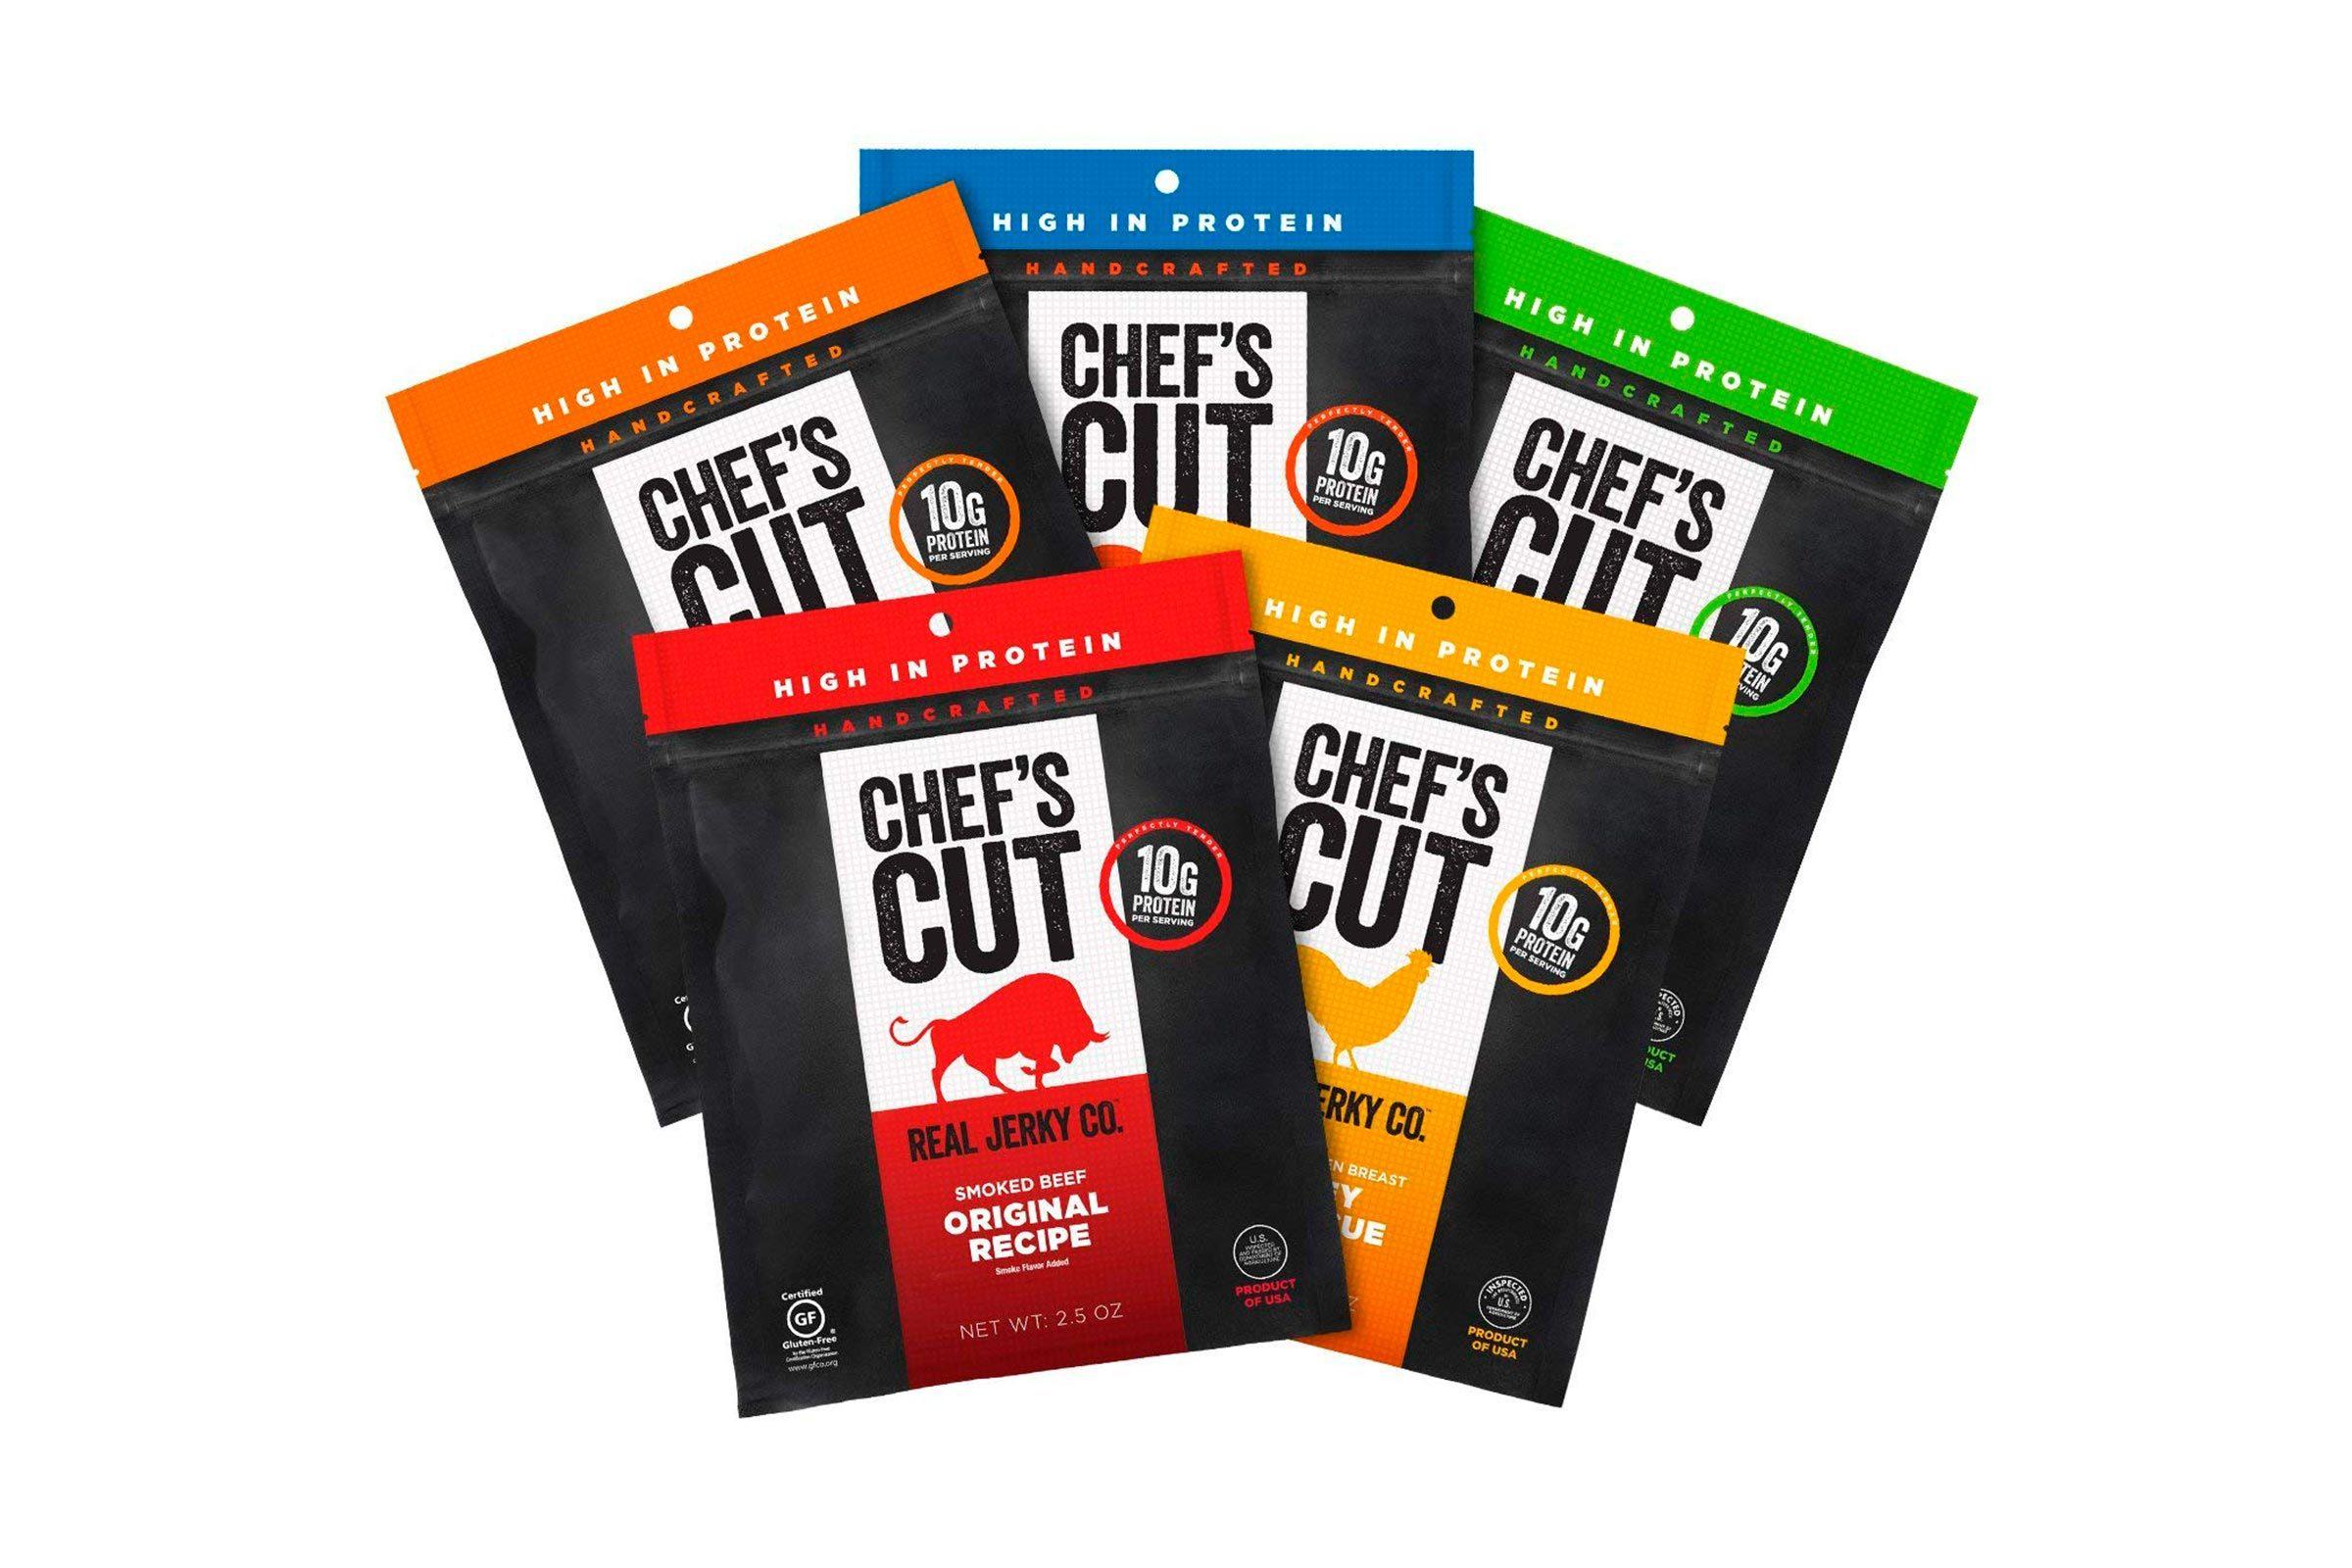 Chef's cut jerky